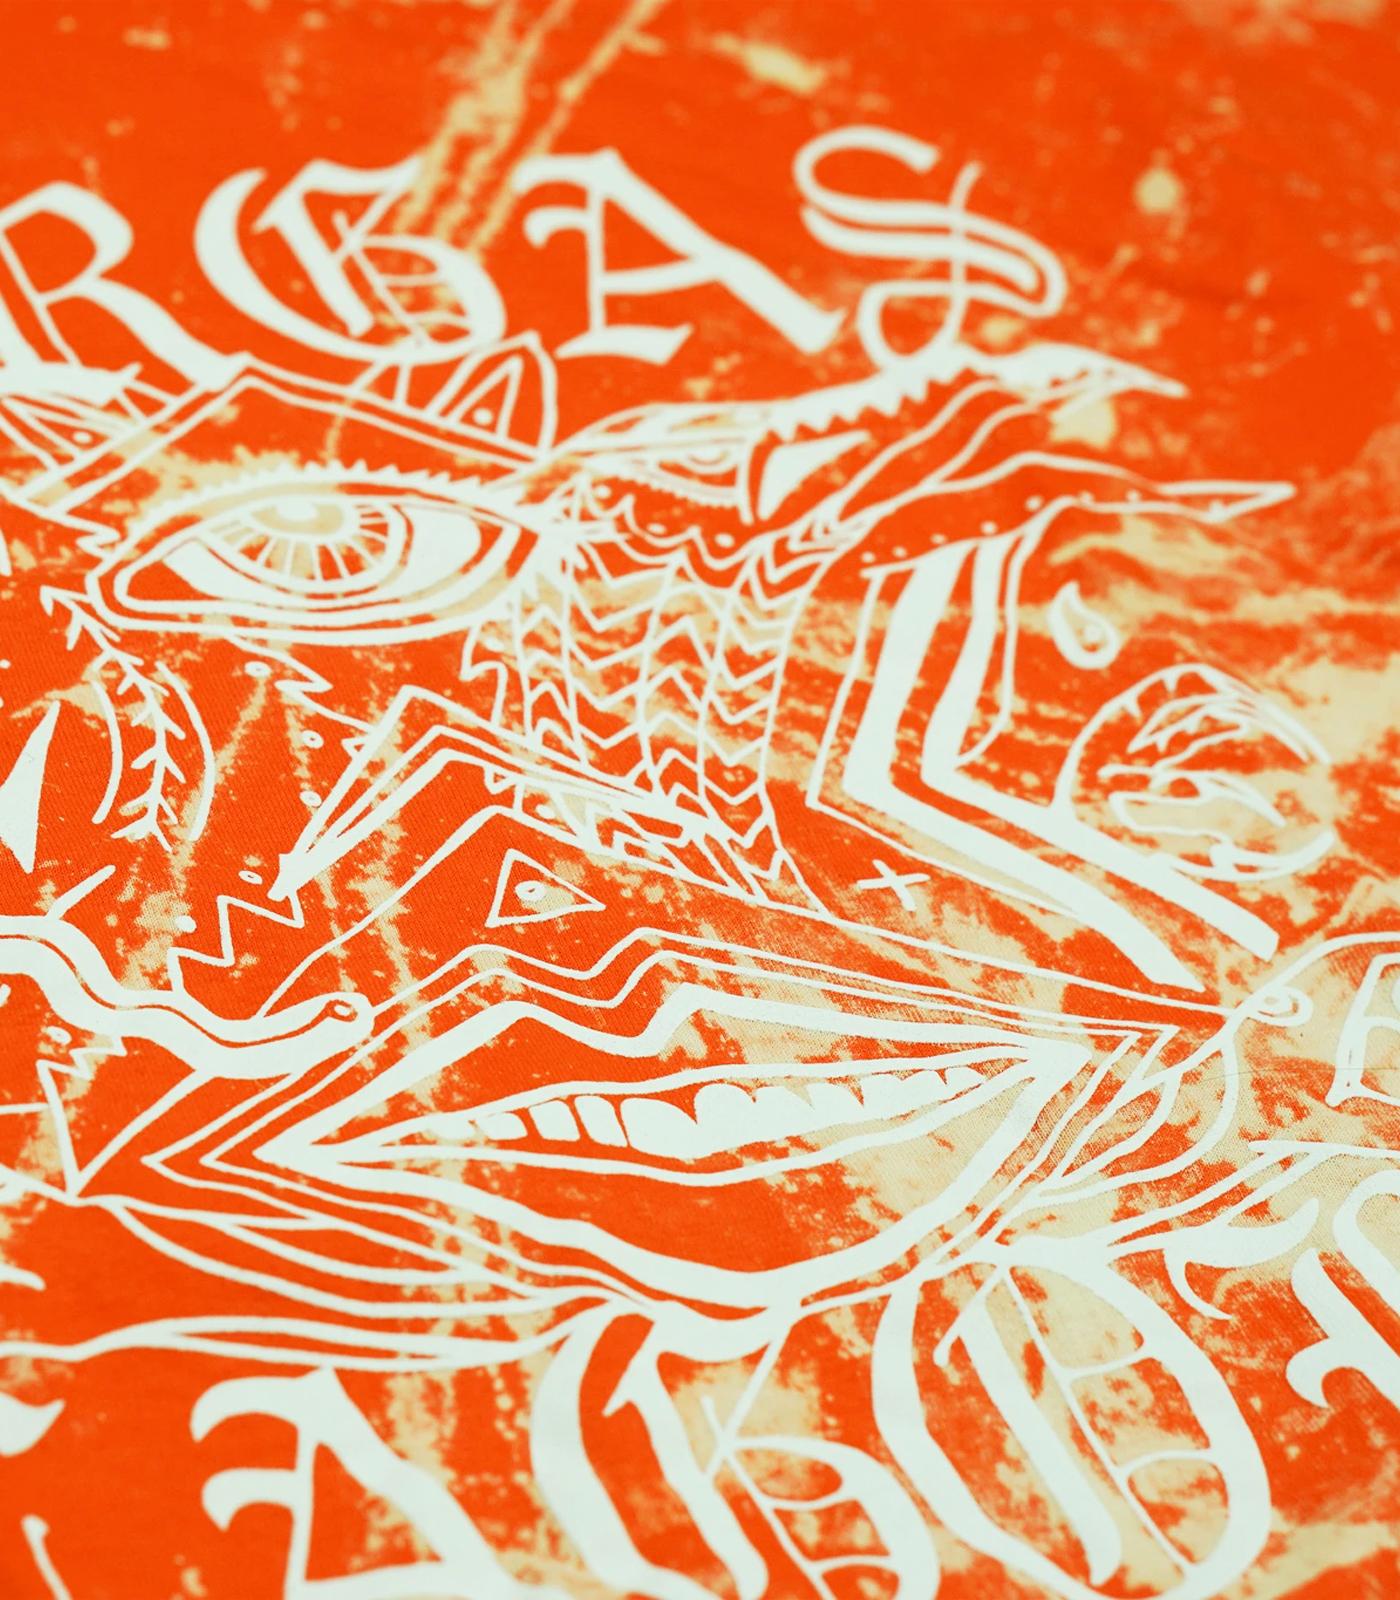 Goth Tie-Dye Orange